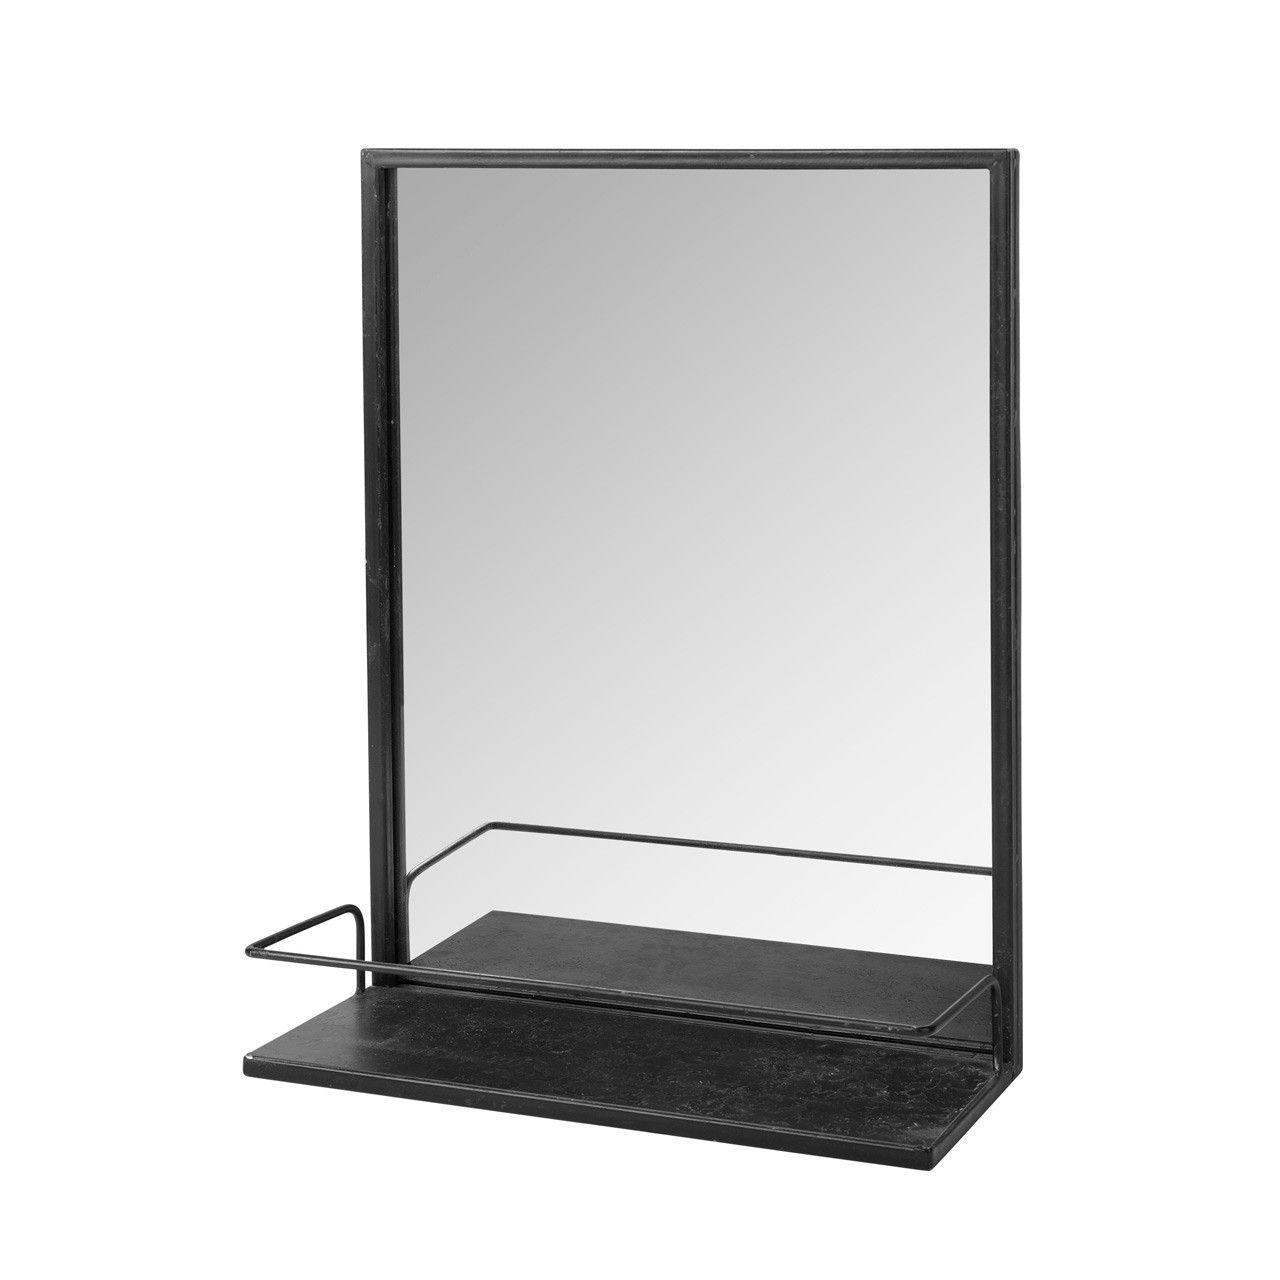 Broste Copenhagen spiegel met plankje Talja ijzer zwart